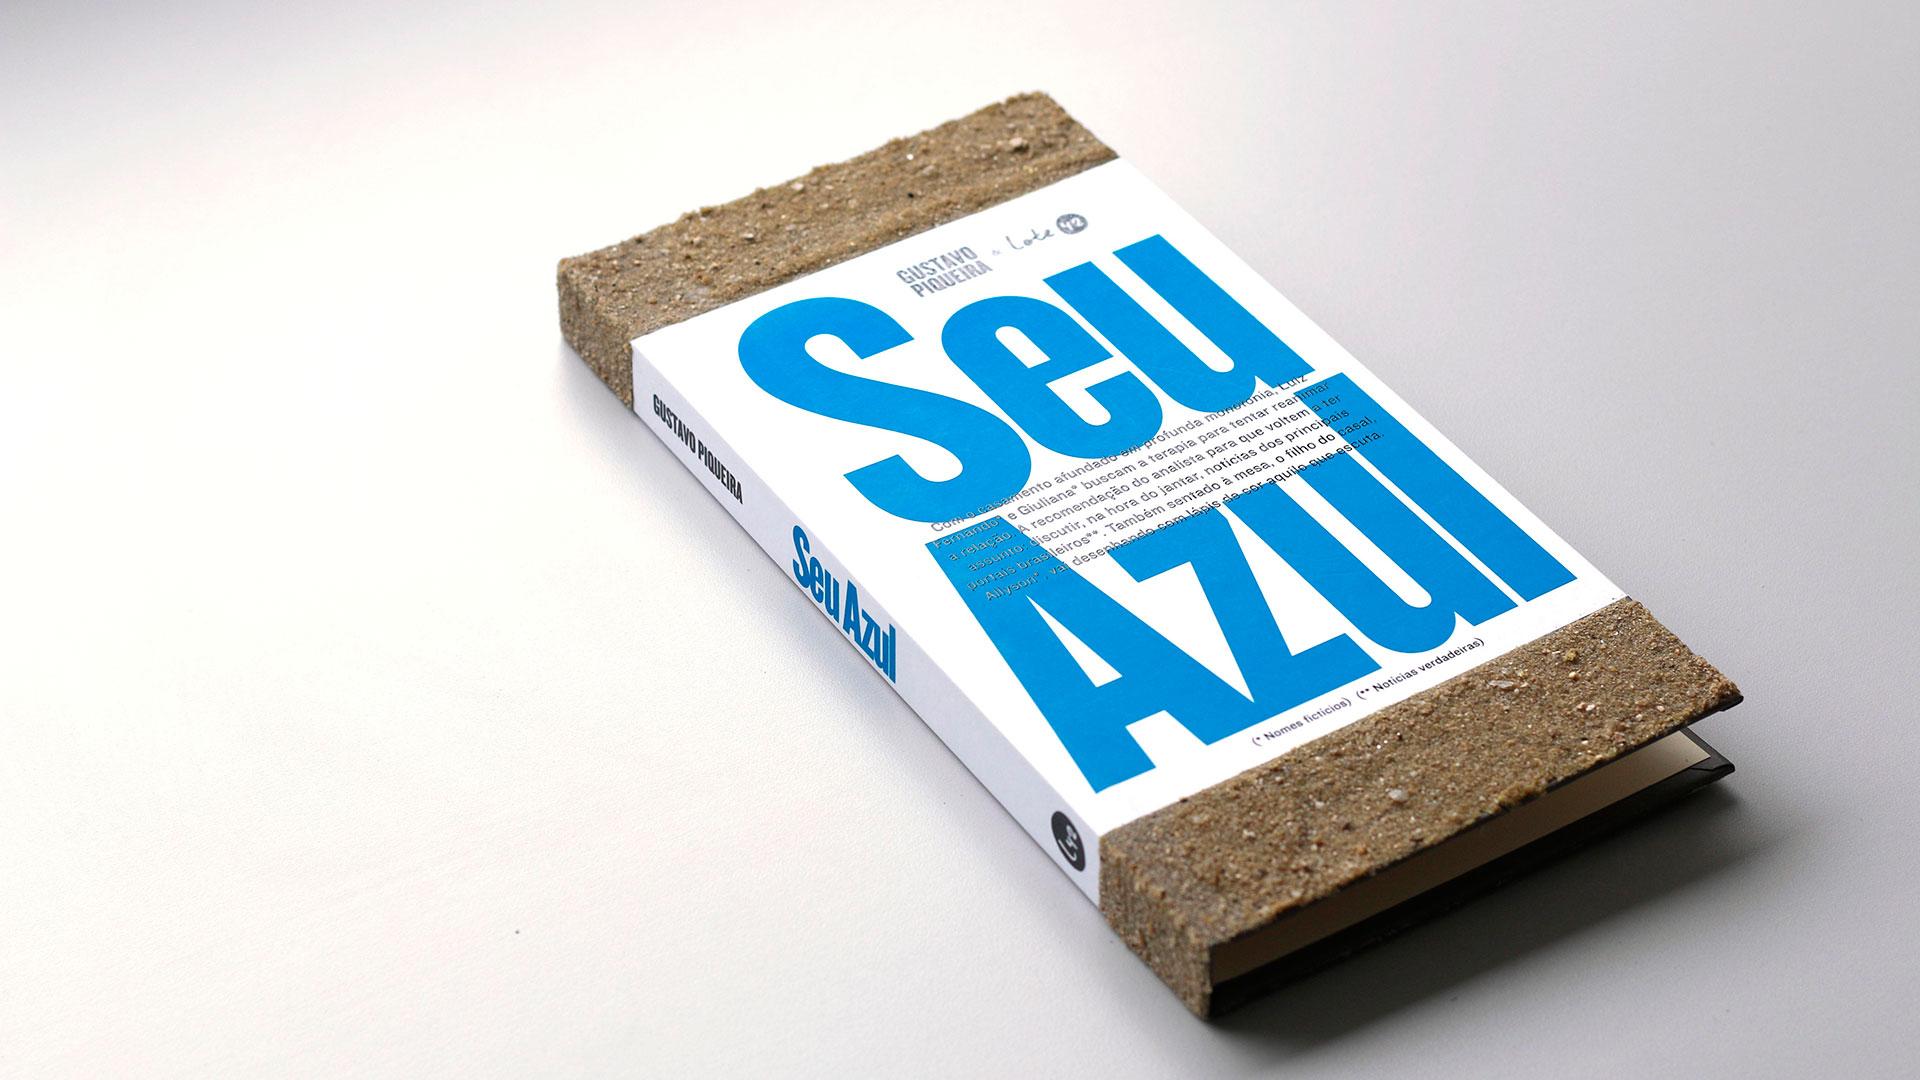 Seu Azul book - PaperSpecs